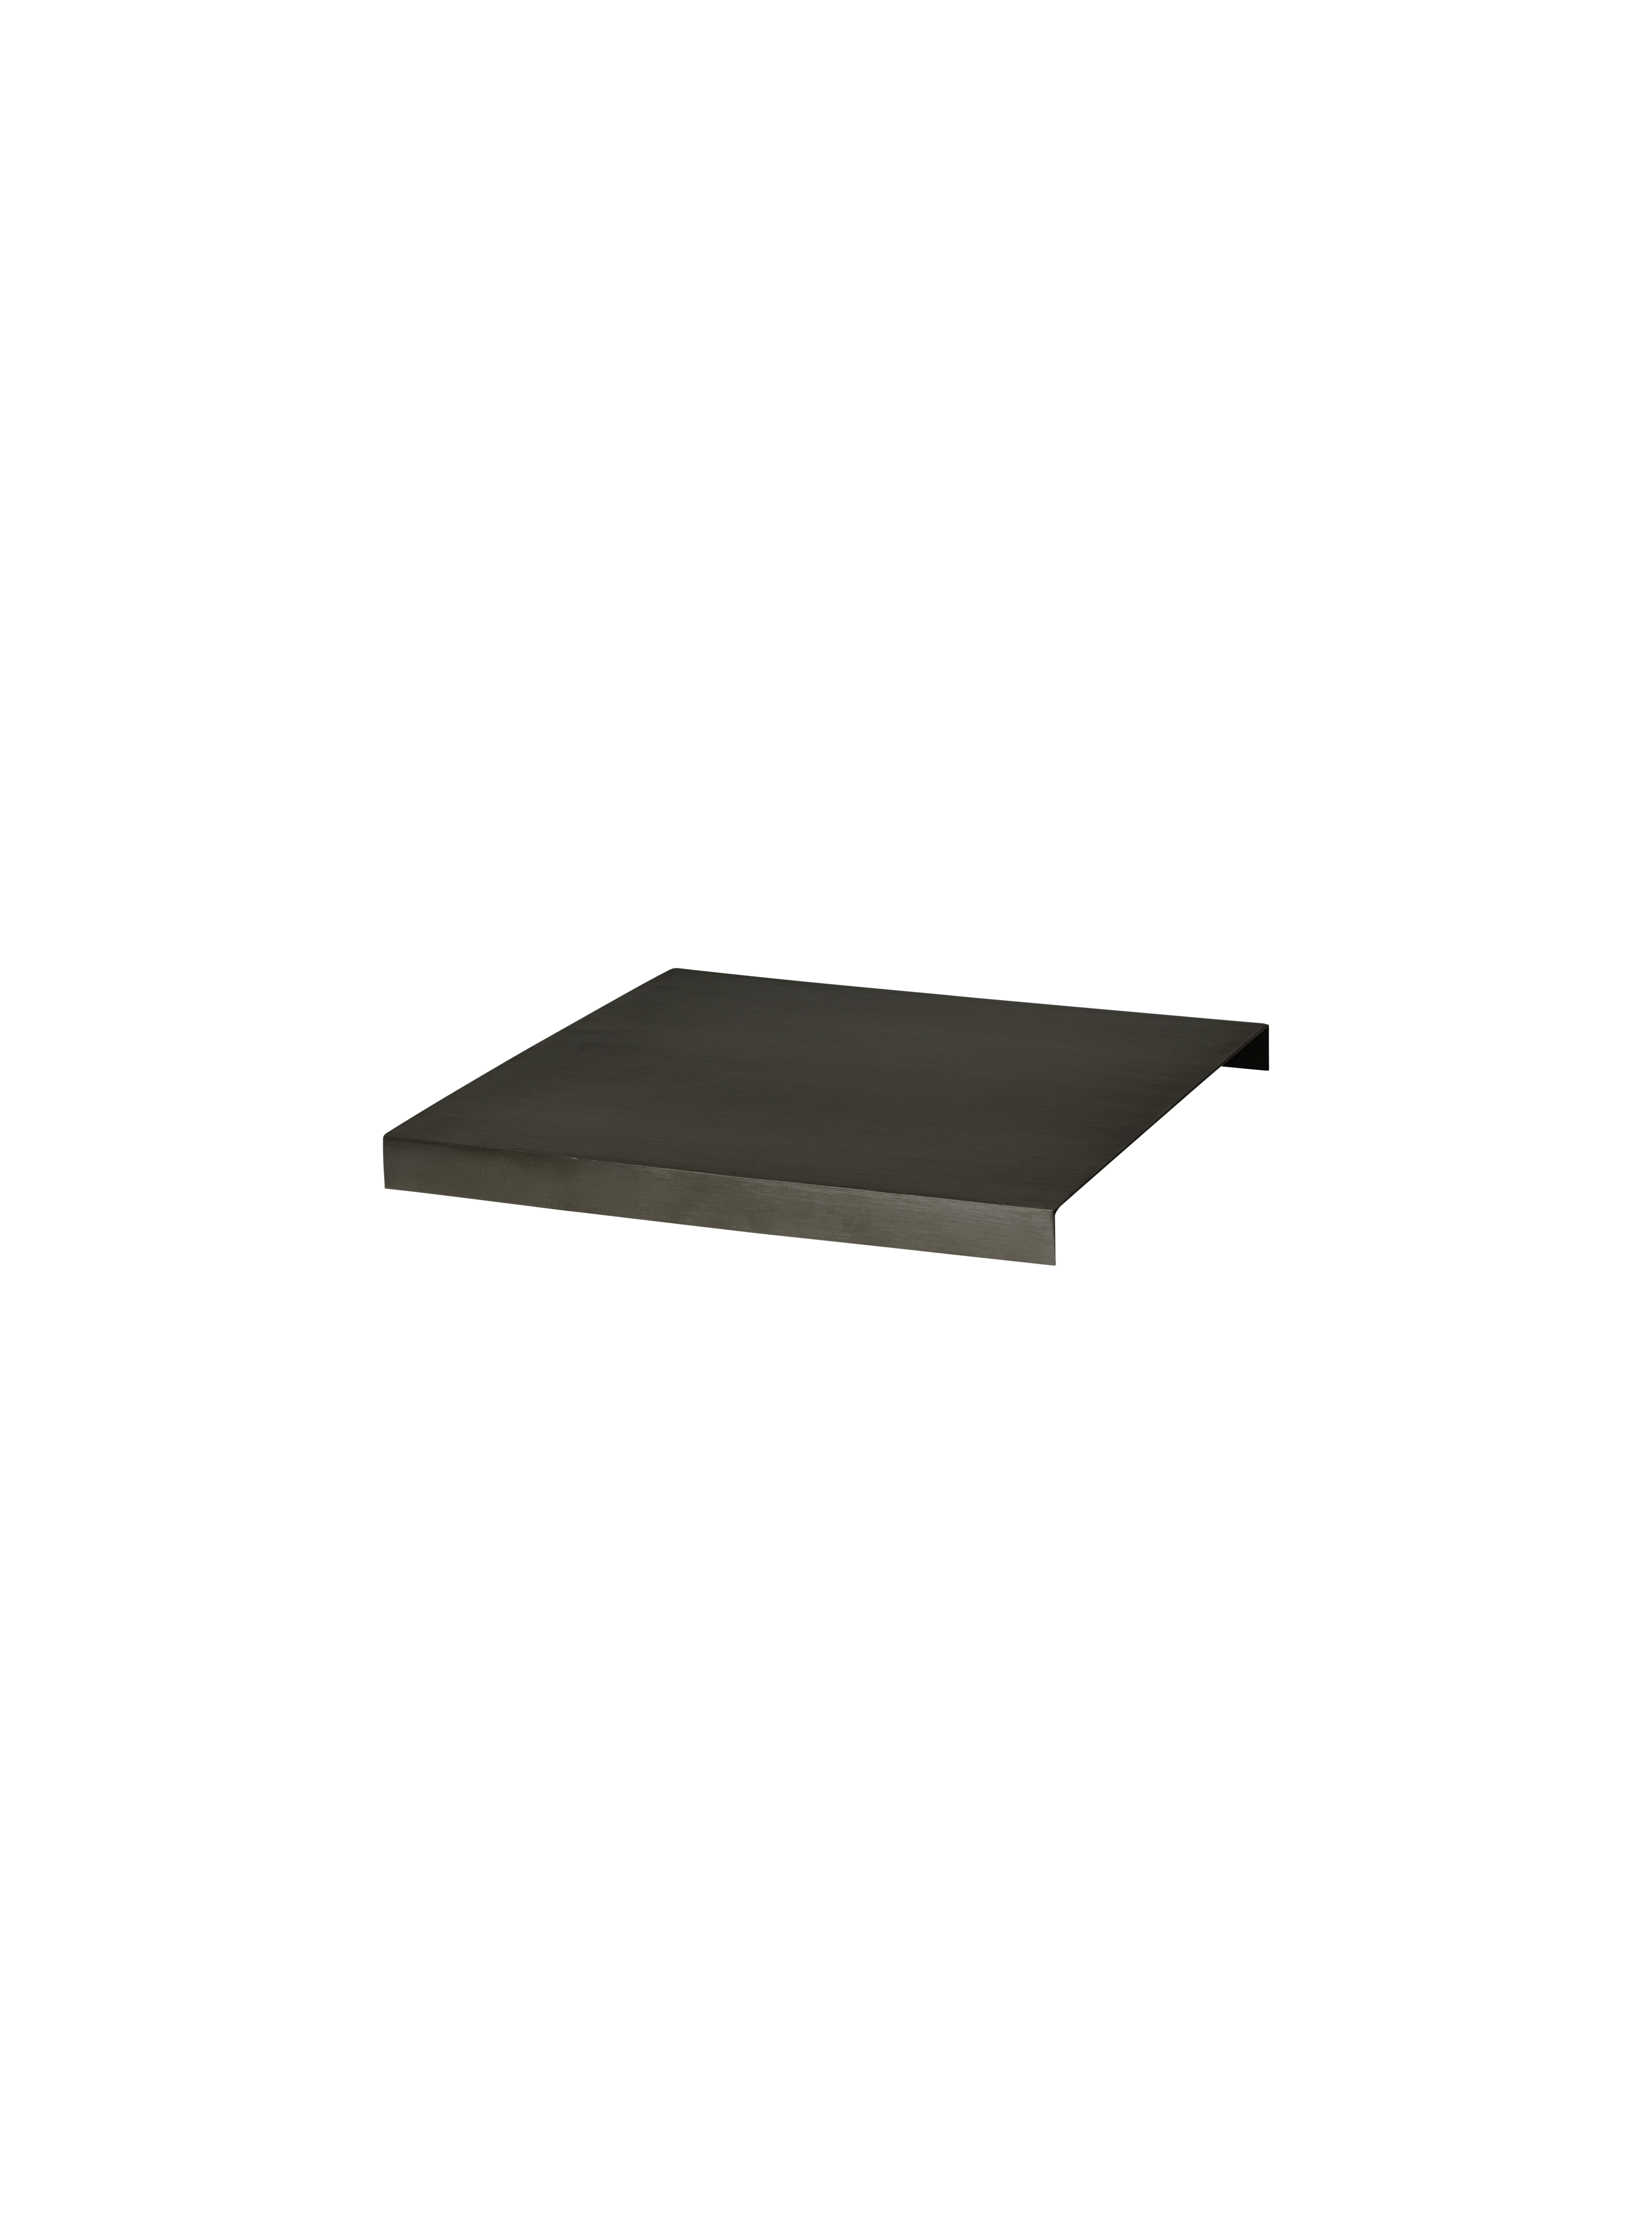 Ferm Living - Tray For Plant Box - Black Brass (5752)